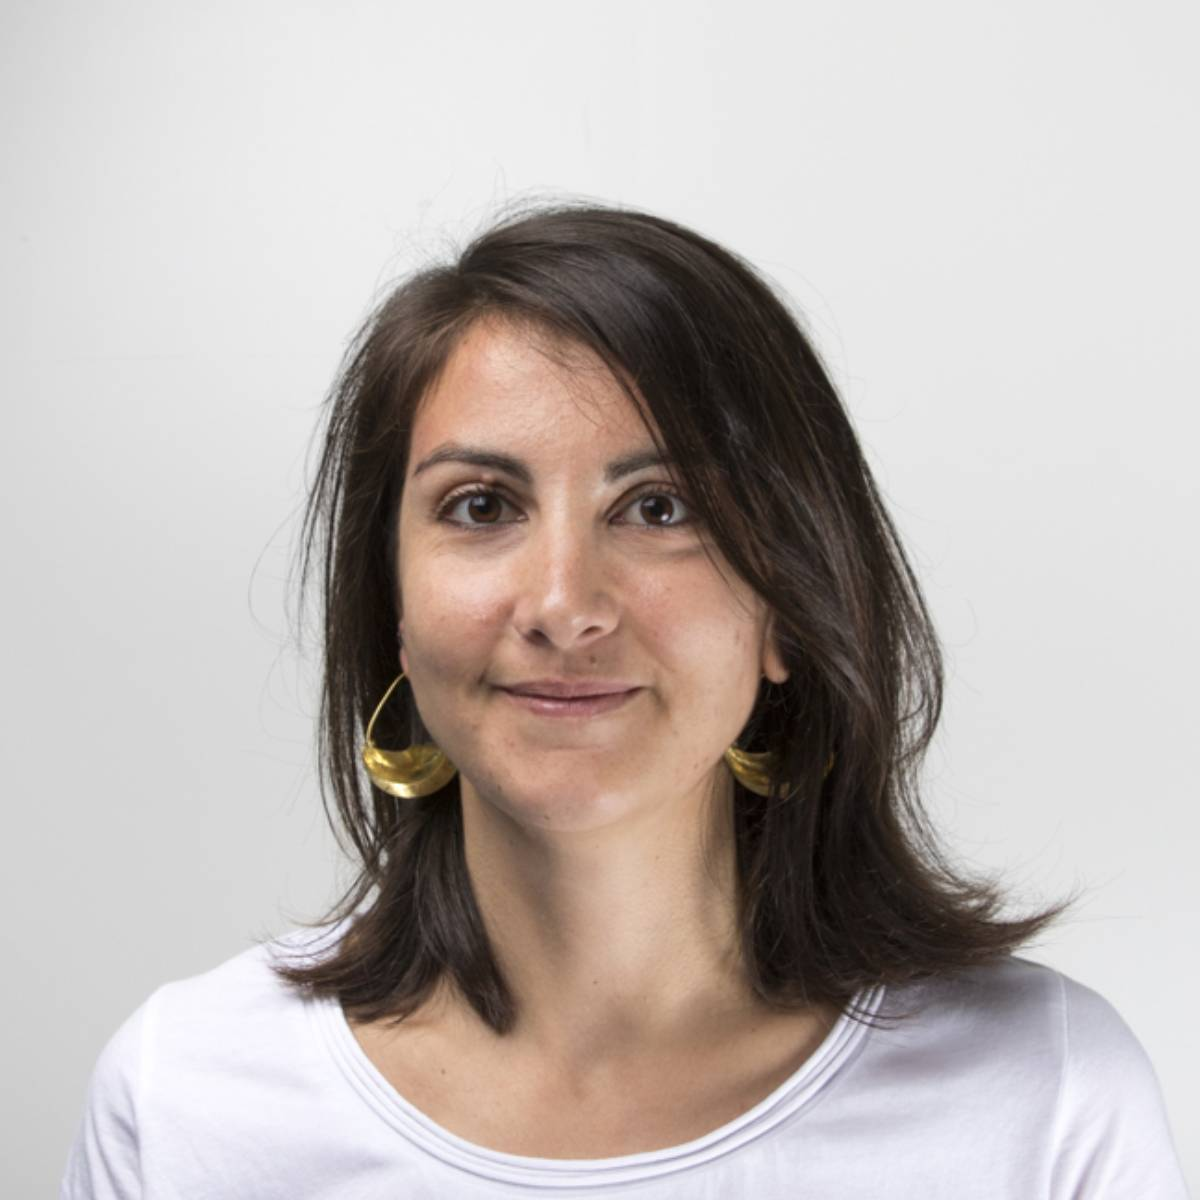 Christina Gkintzou